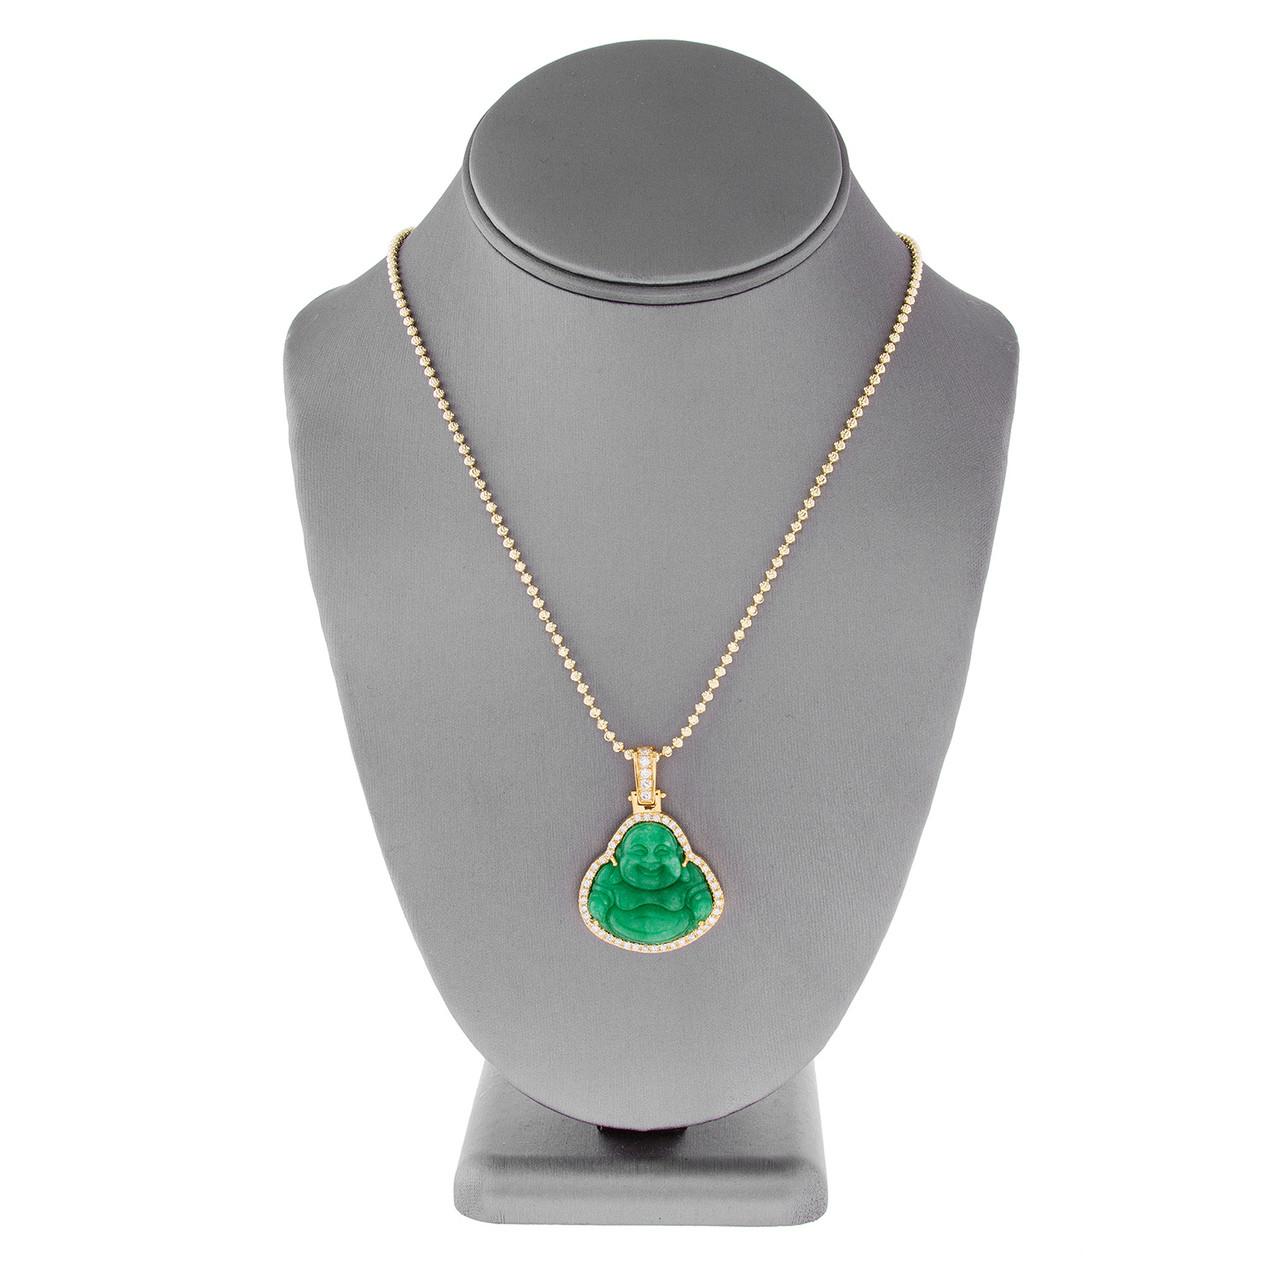 e71c4c7a351ecb 14k Yellow Gold 1.5ct Diamond Jade Buddha Pendant - Shyne Jewelers